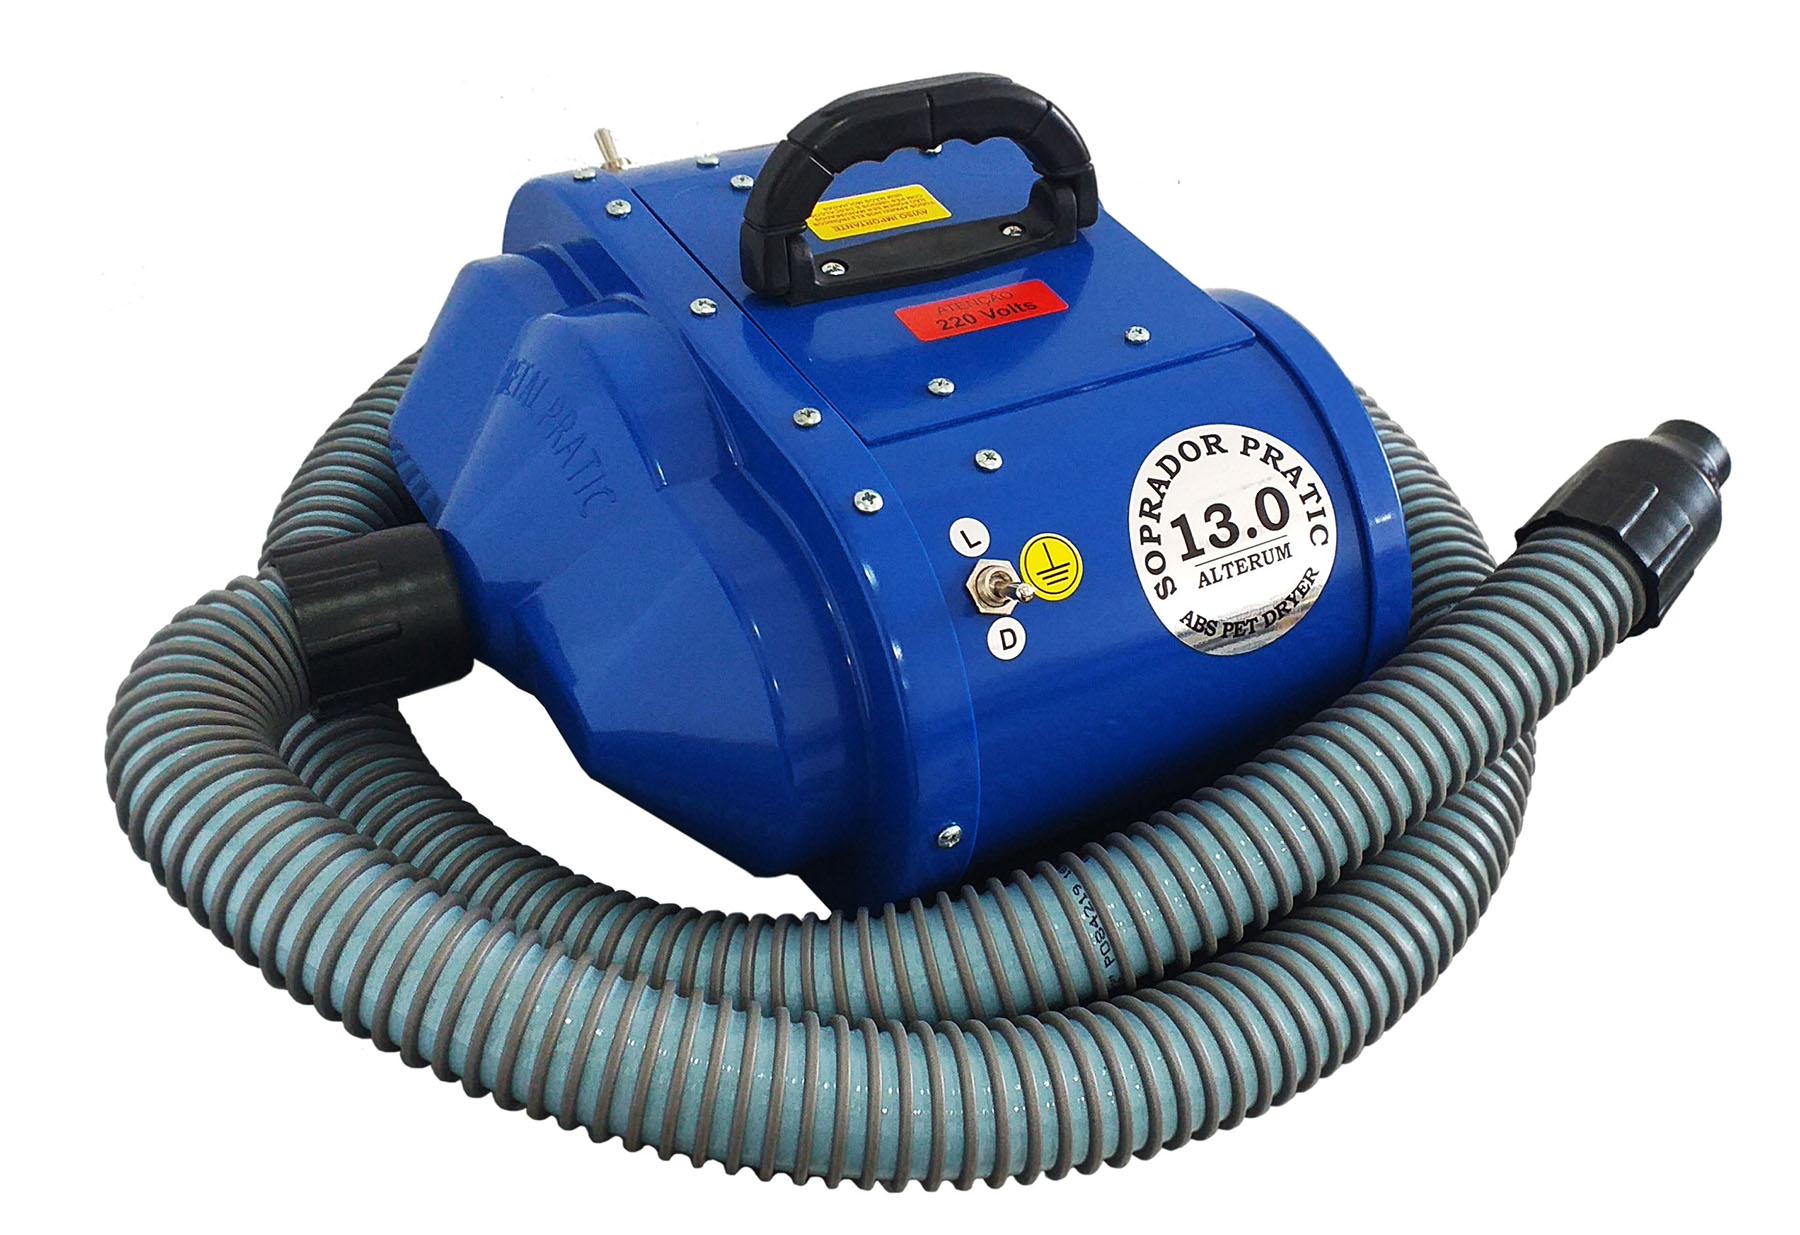 Soprador Alterum 13.0 Azul 110V